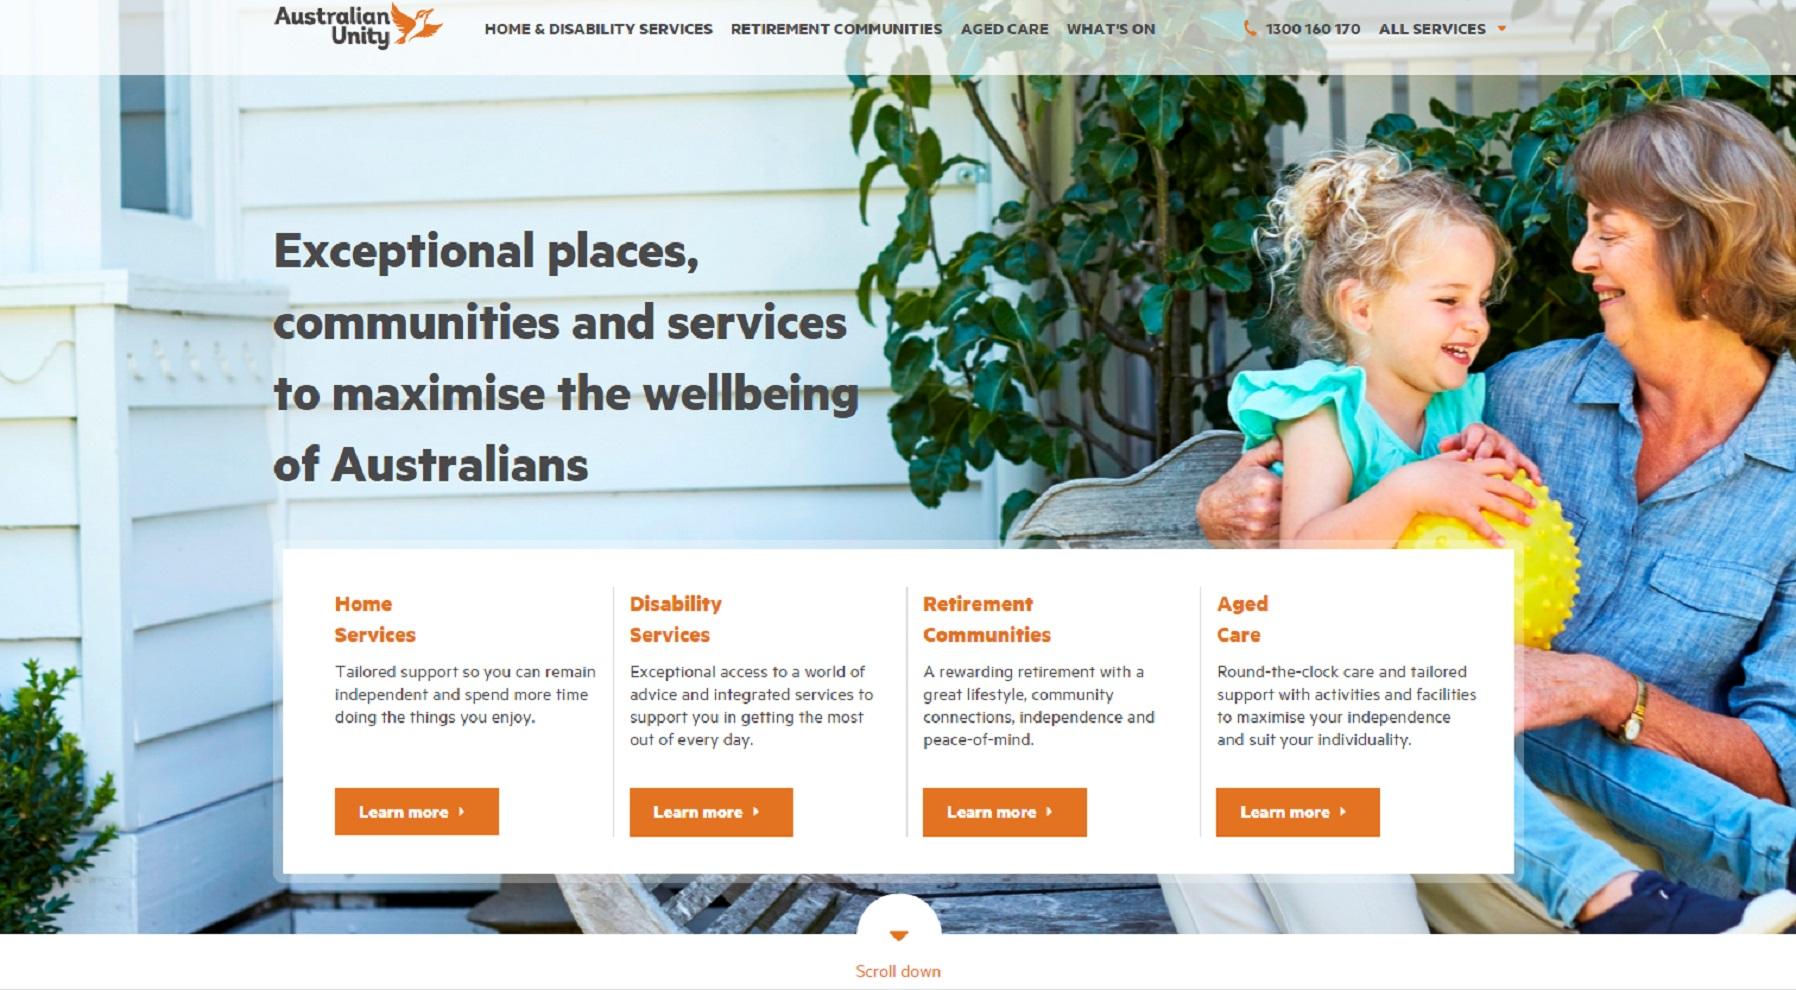 Independent & Assisted Living Website image